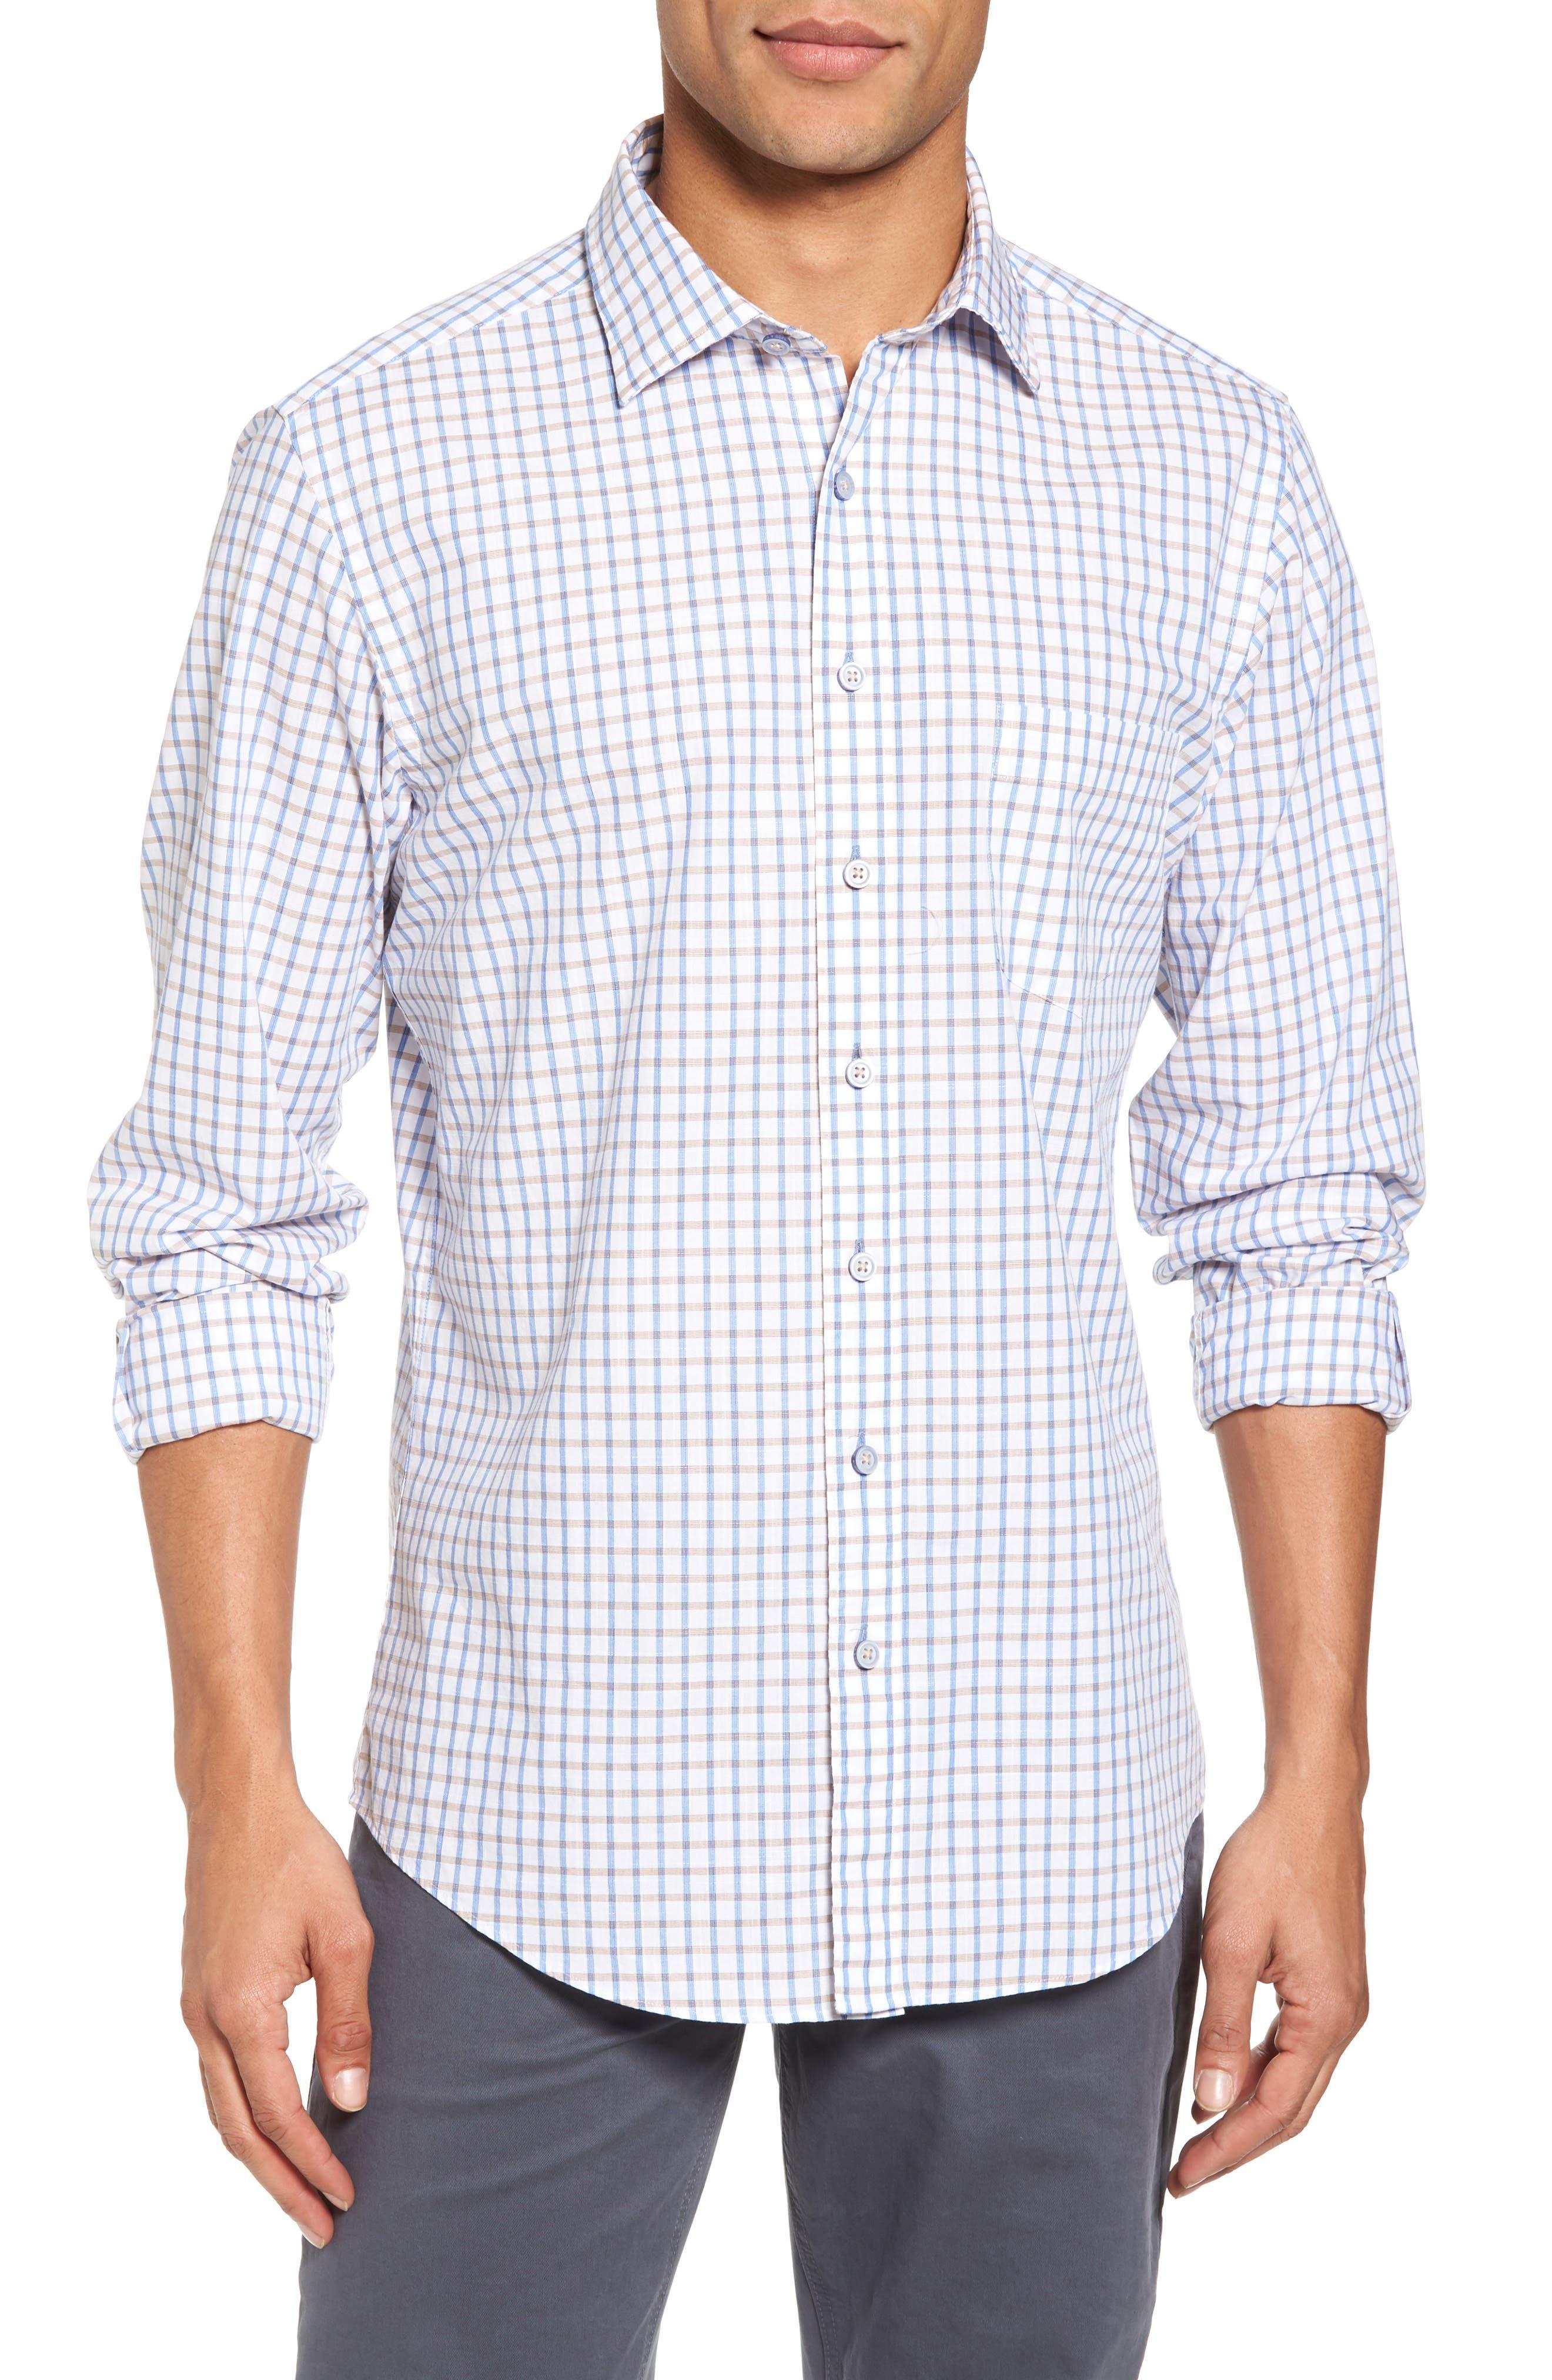 Mount Edward Check Sport Shirt,                         Main,                         color, 111